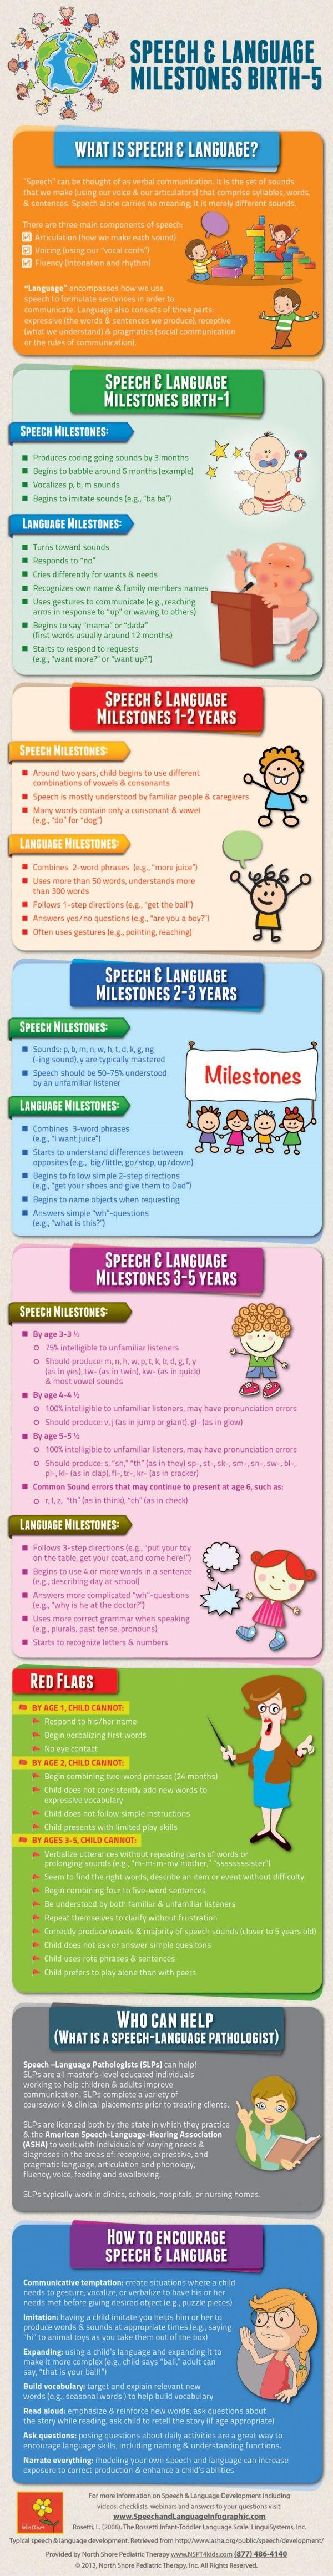 speech language milestones